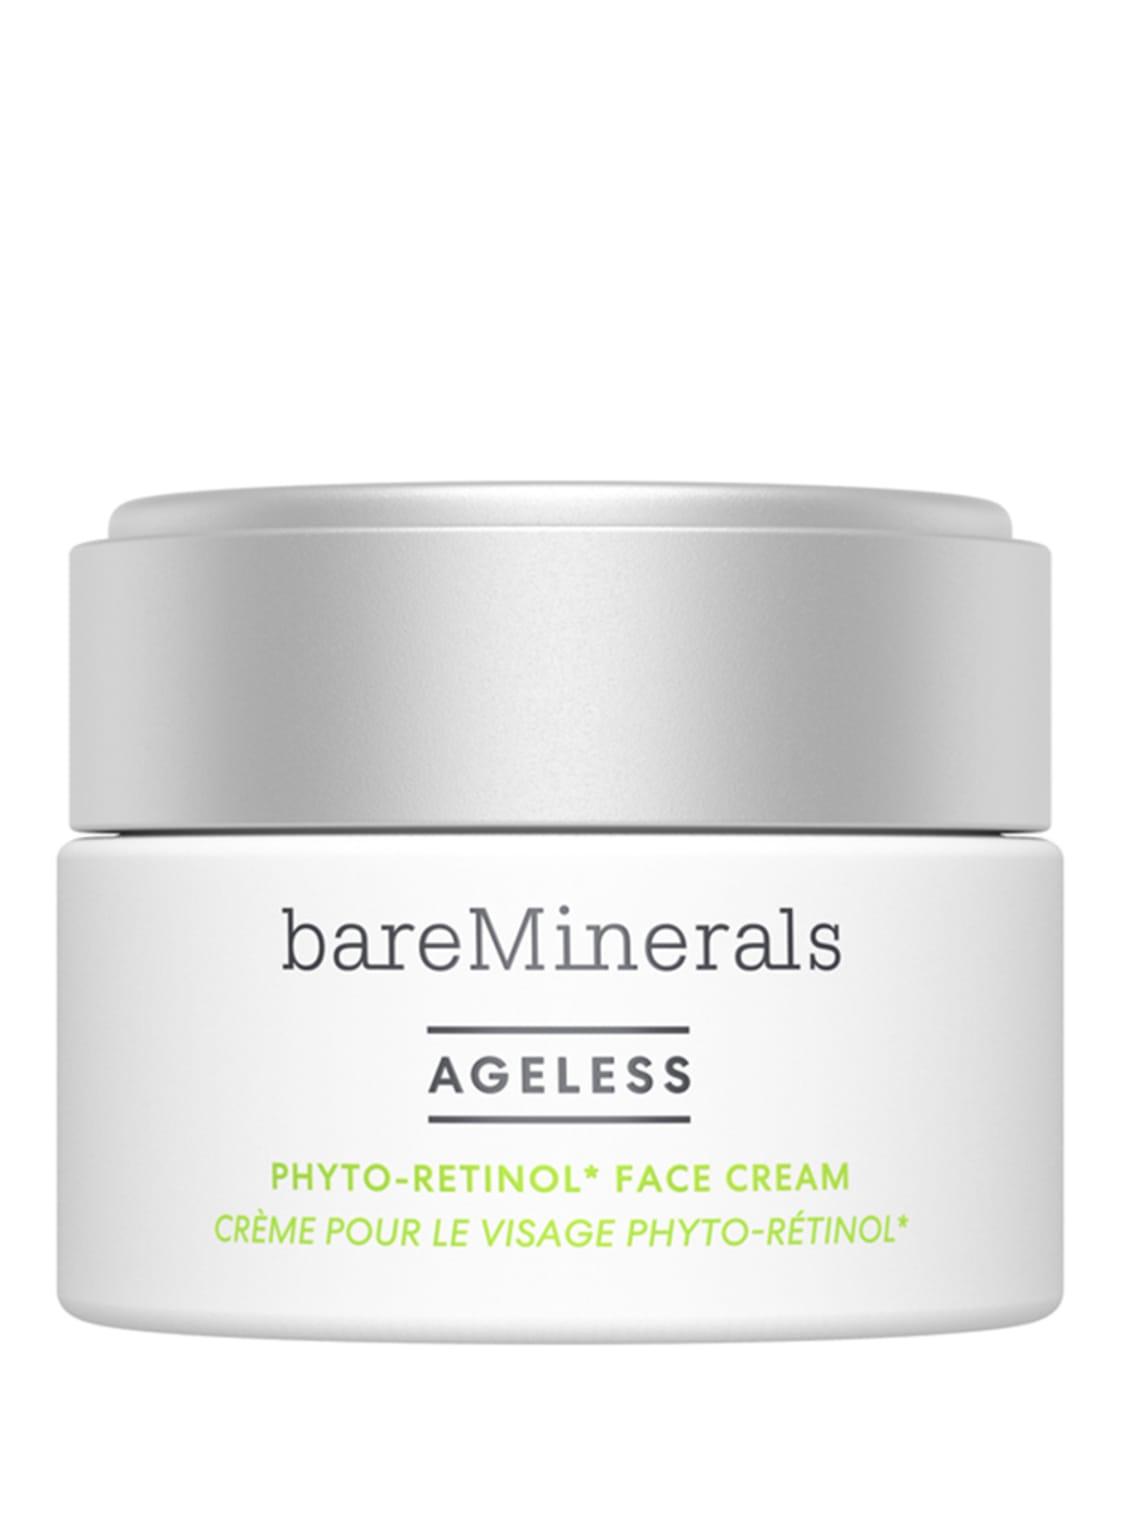 Image of Bareminerals Ageless Phyto-Retinol Face Cream 50 gr